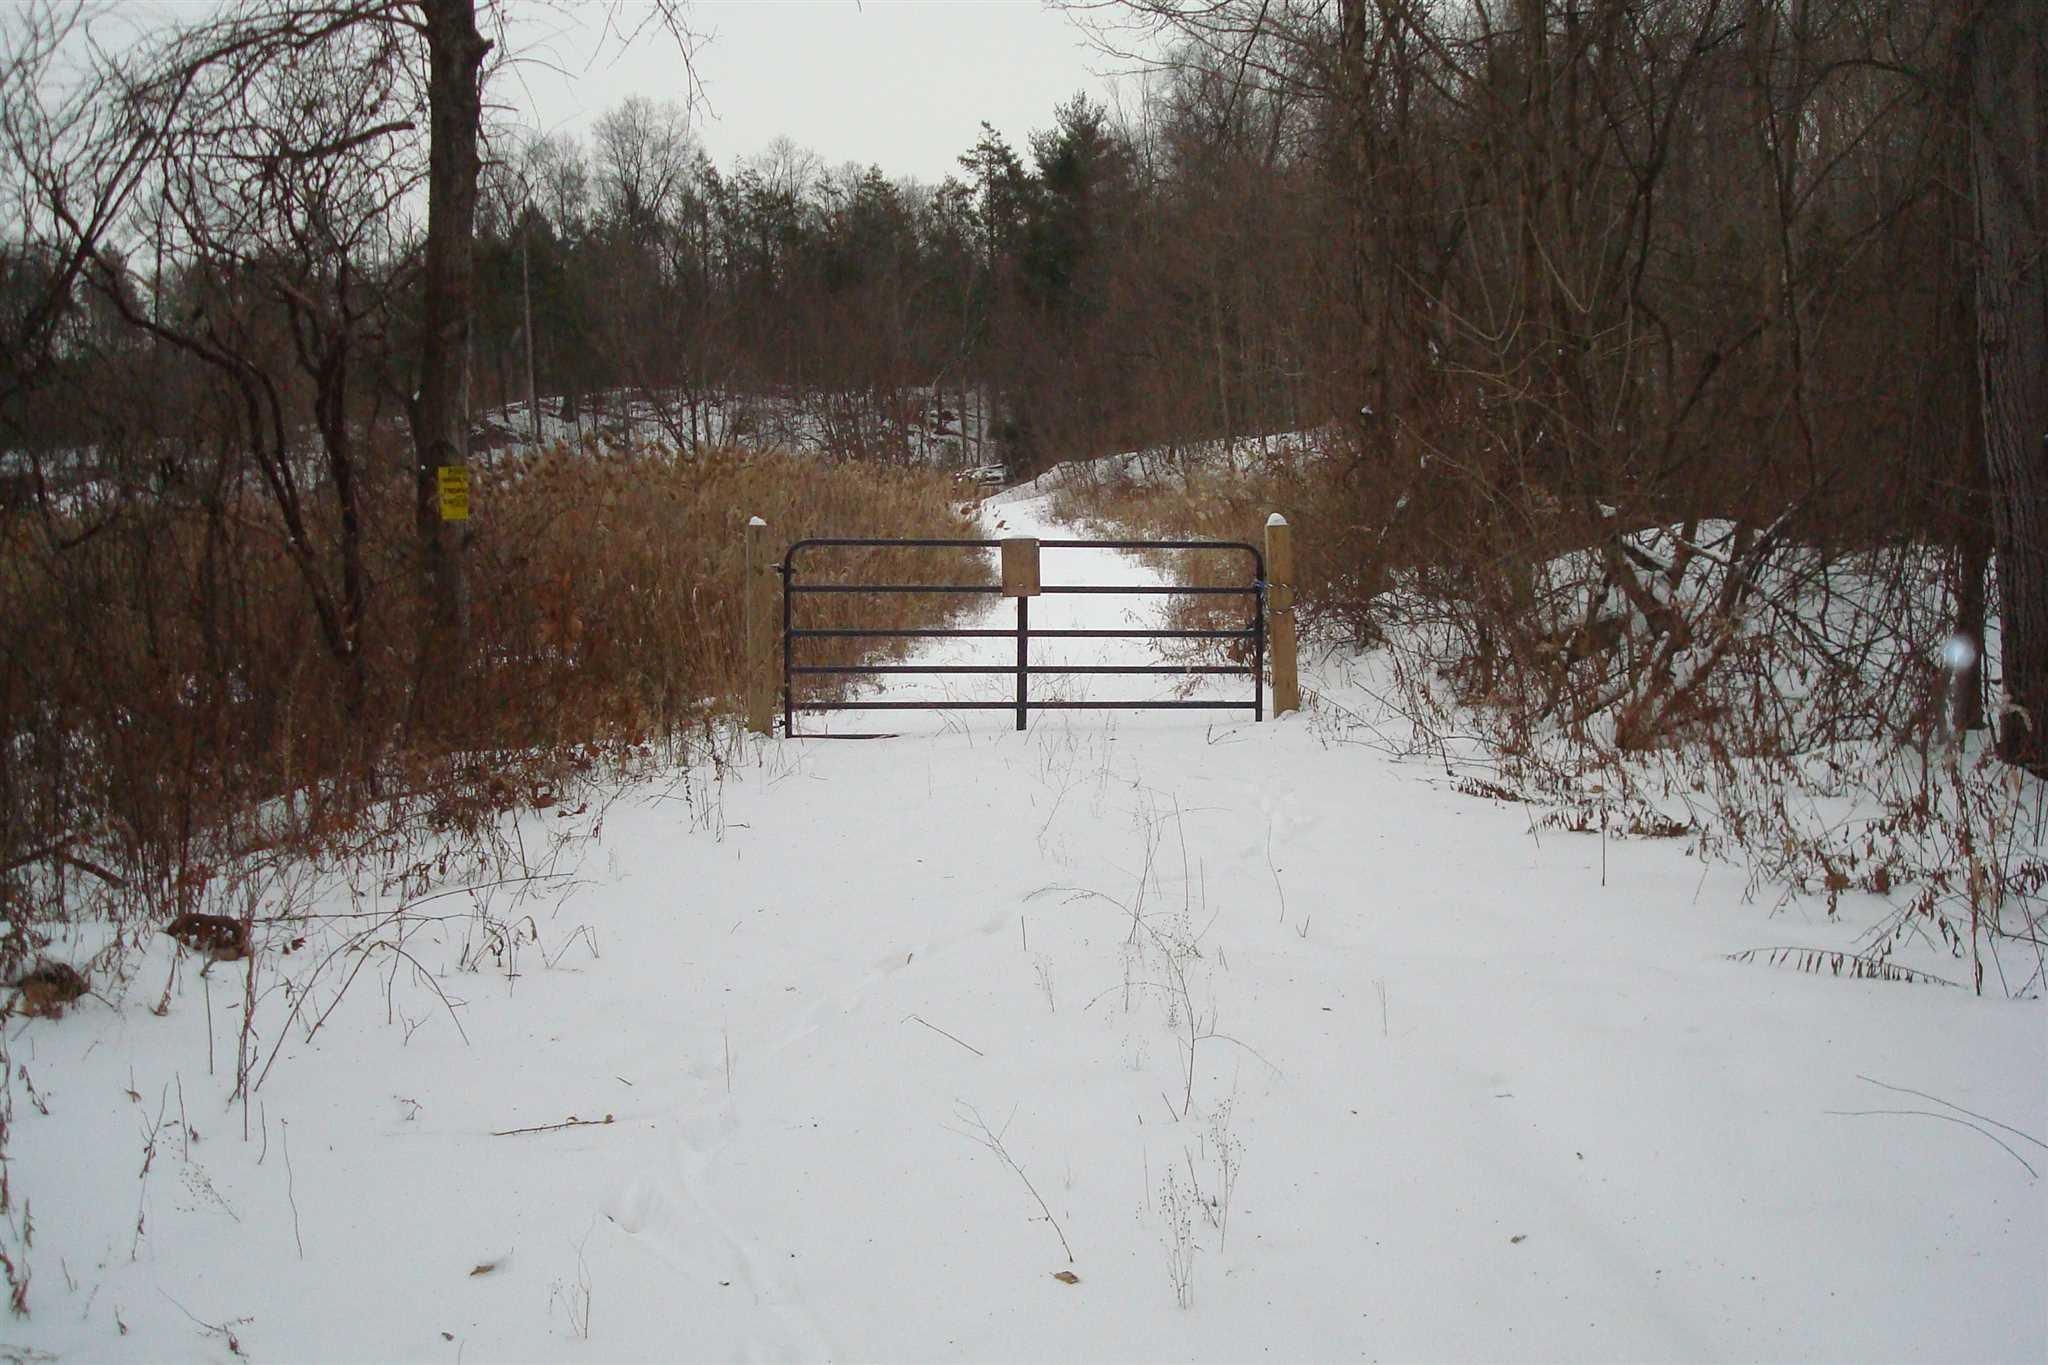 Land for Sale at 28 CEDAR 28 CEDAR Hyde Park, New York 12580 United States